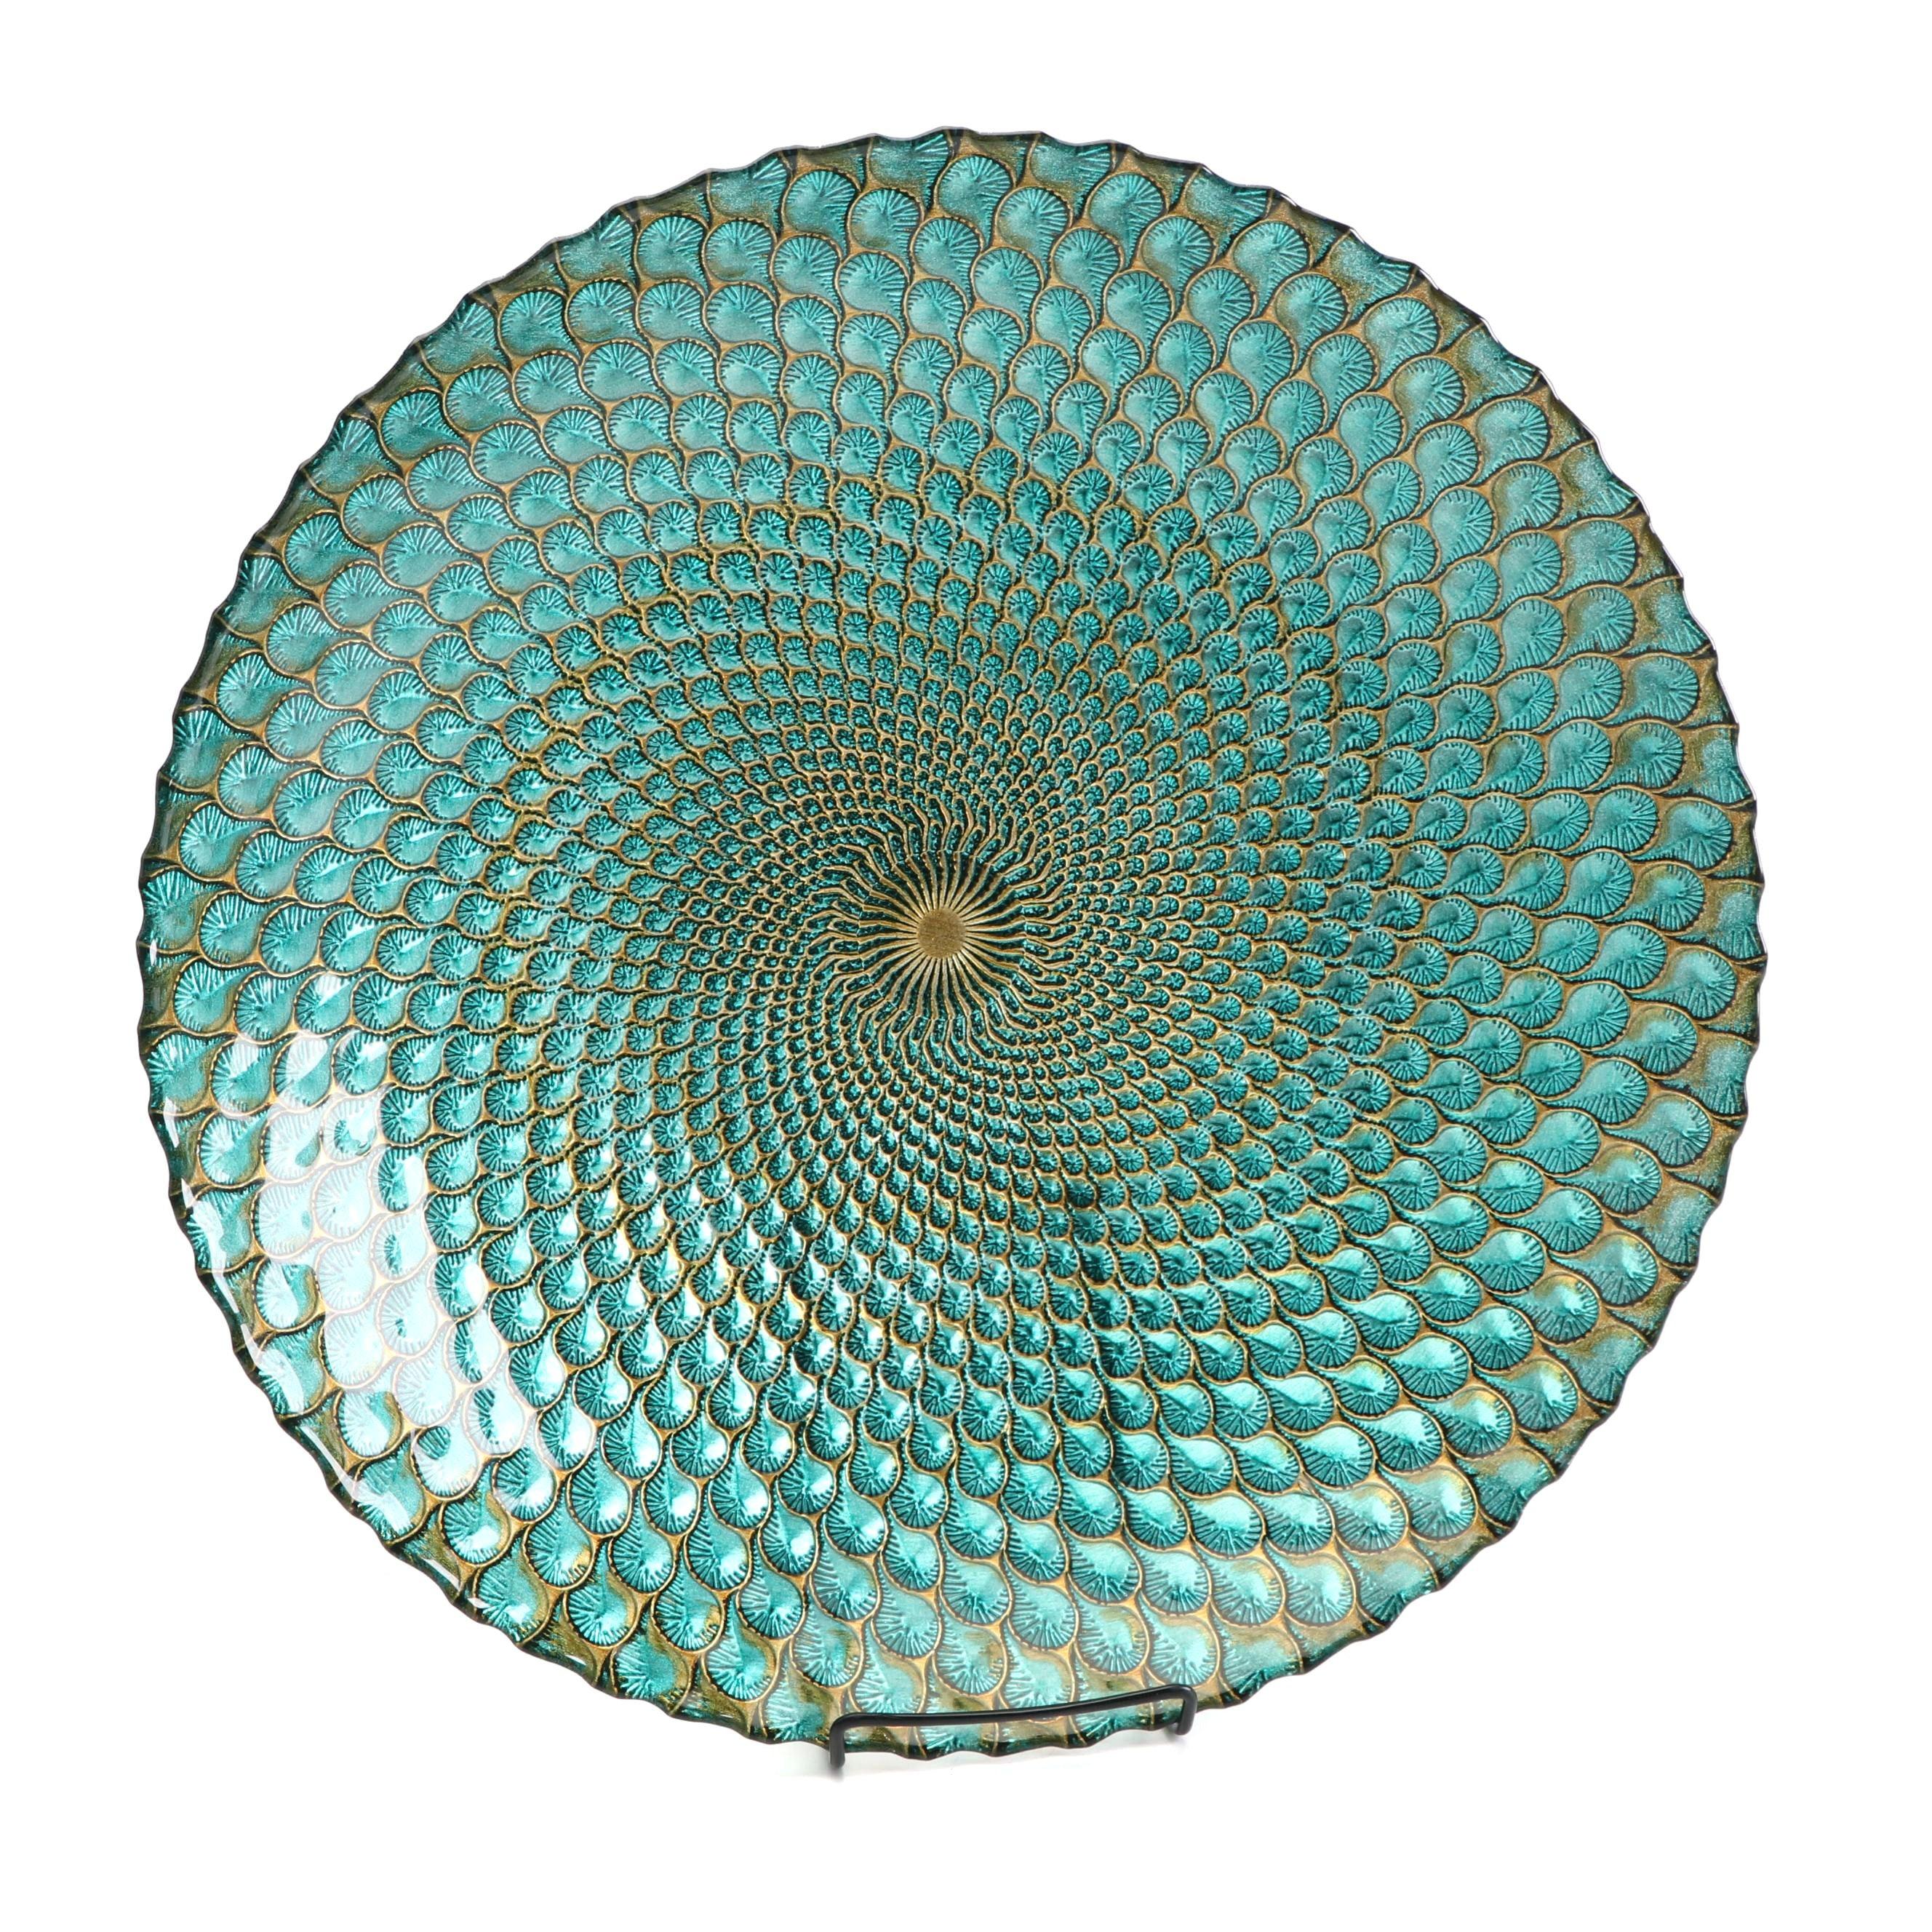 Decorative Peacock Inspired Centerpiece Bowl